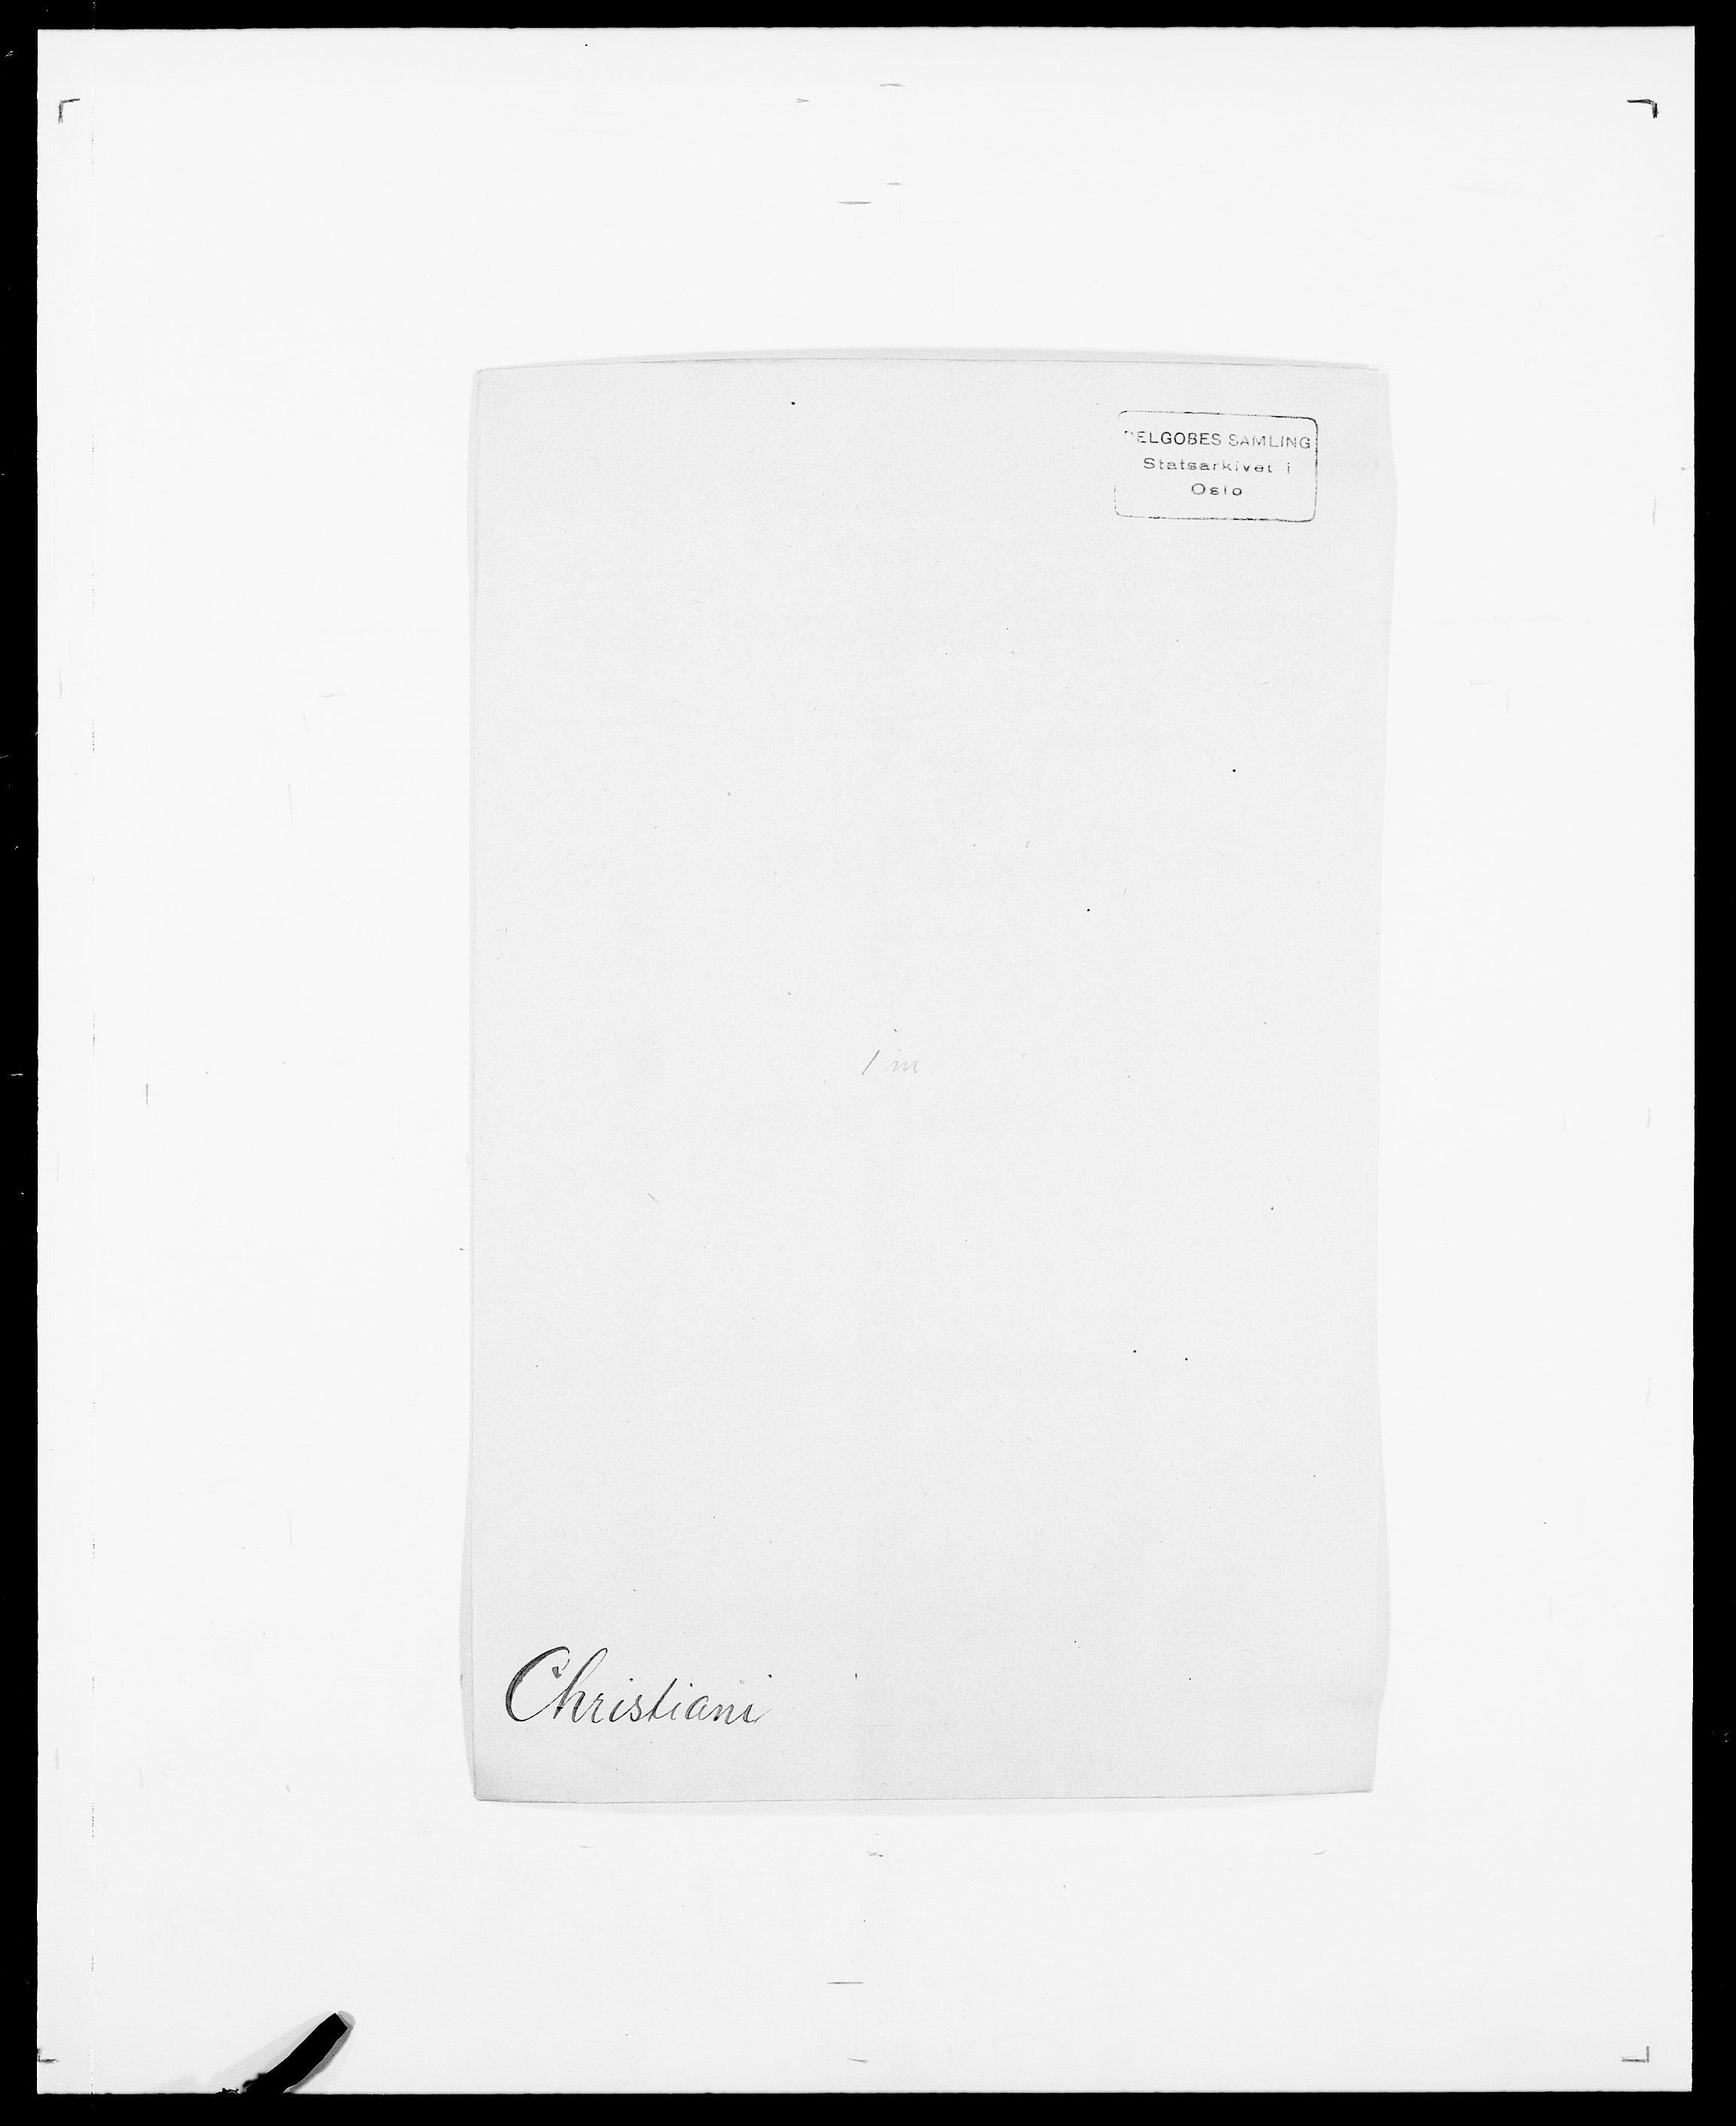 SAO, Delgobe, Charles Antoine - samling, D/Da/L0008: Capjon - Dagenbolt, s. 221